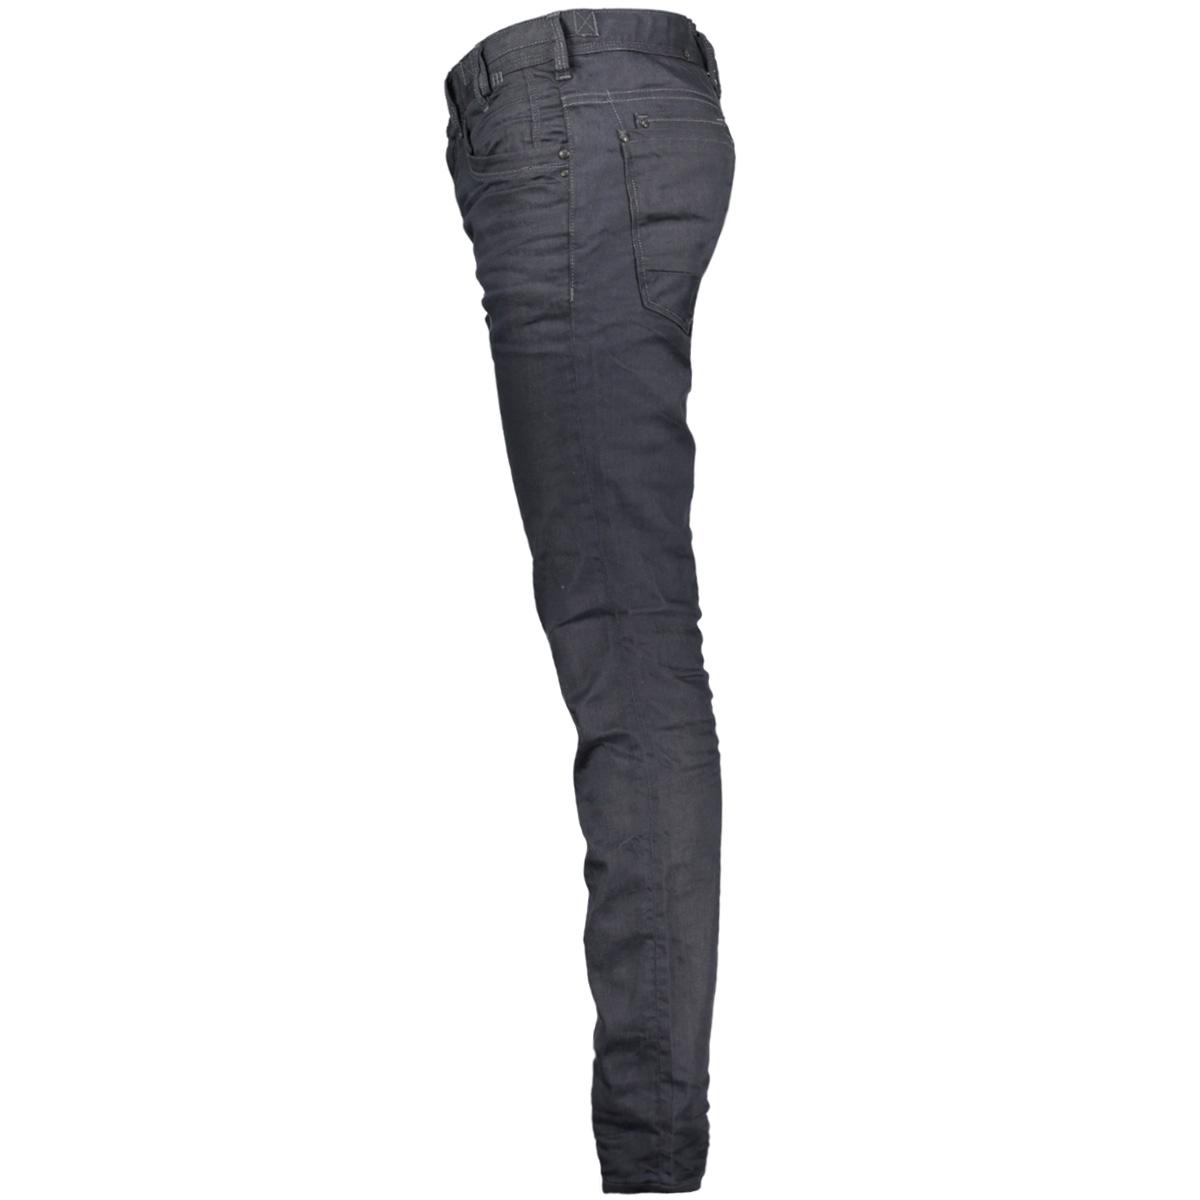 vtr525 vanguard jeans dcg